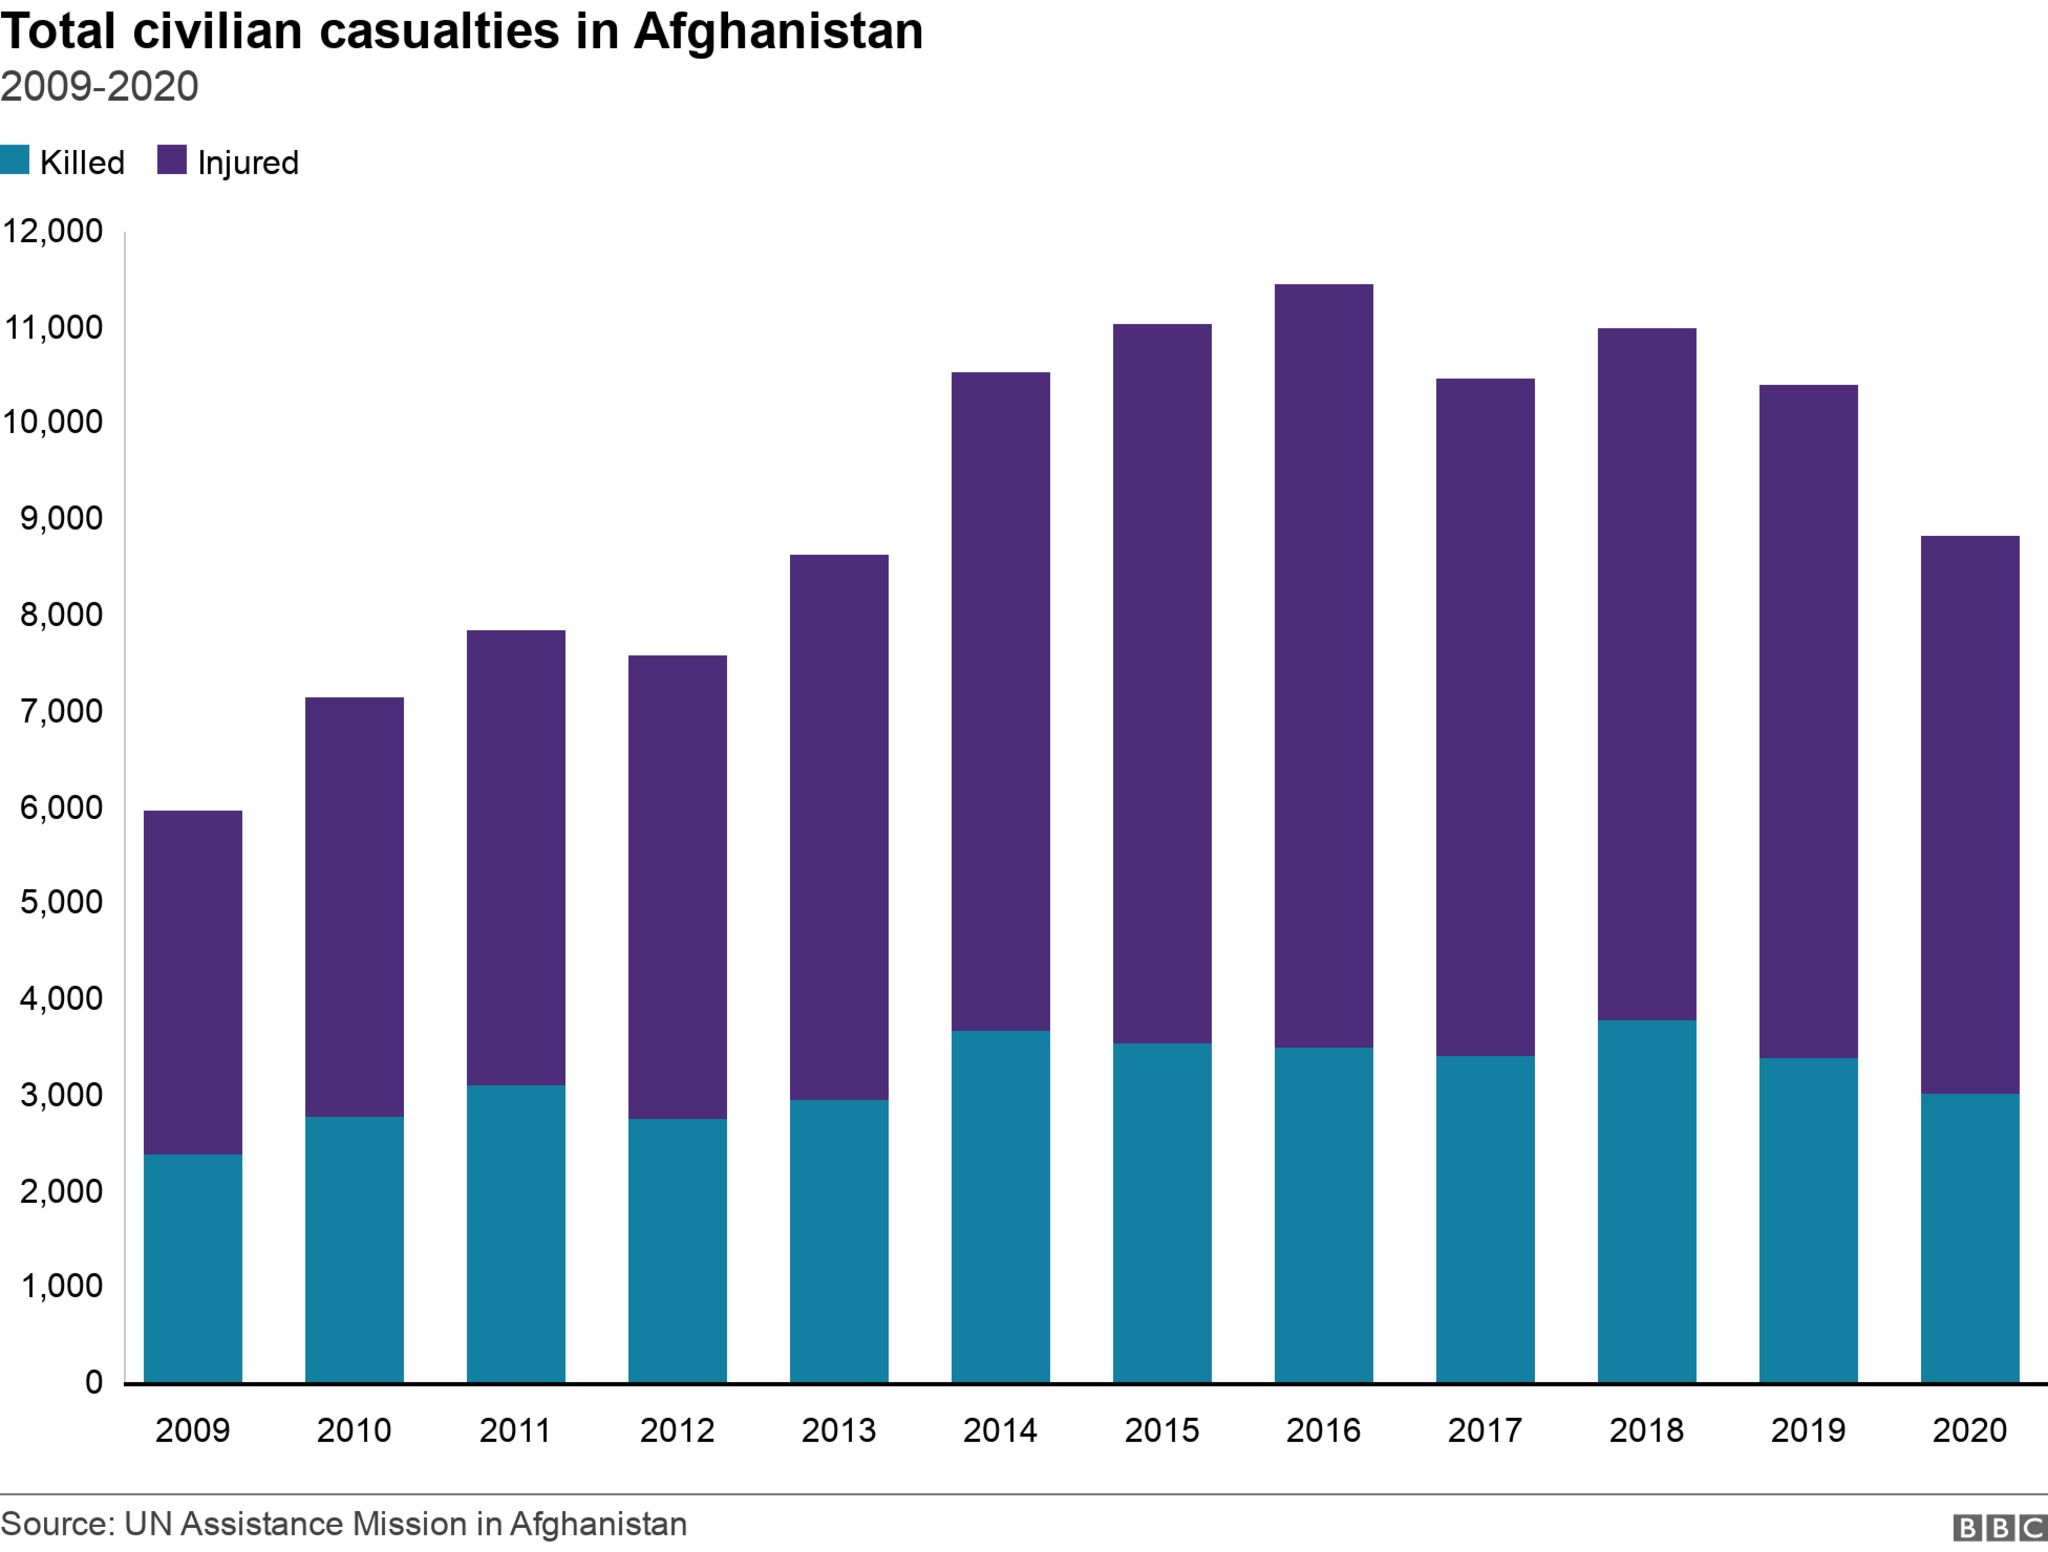 Civilian casualties in Afghanistan